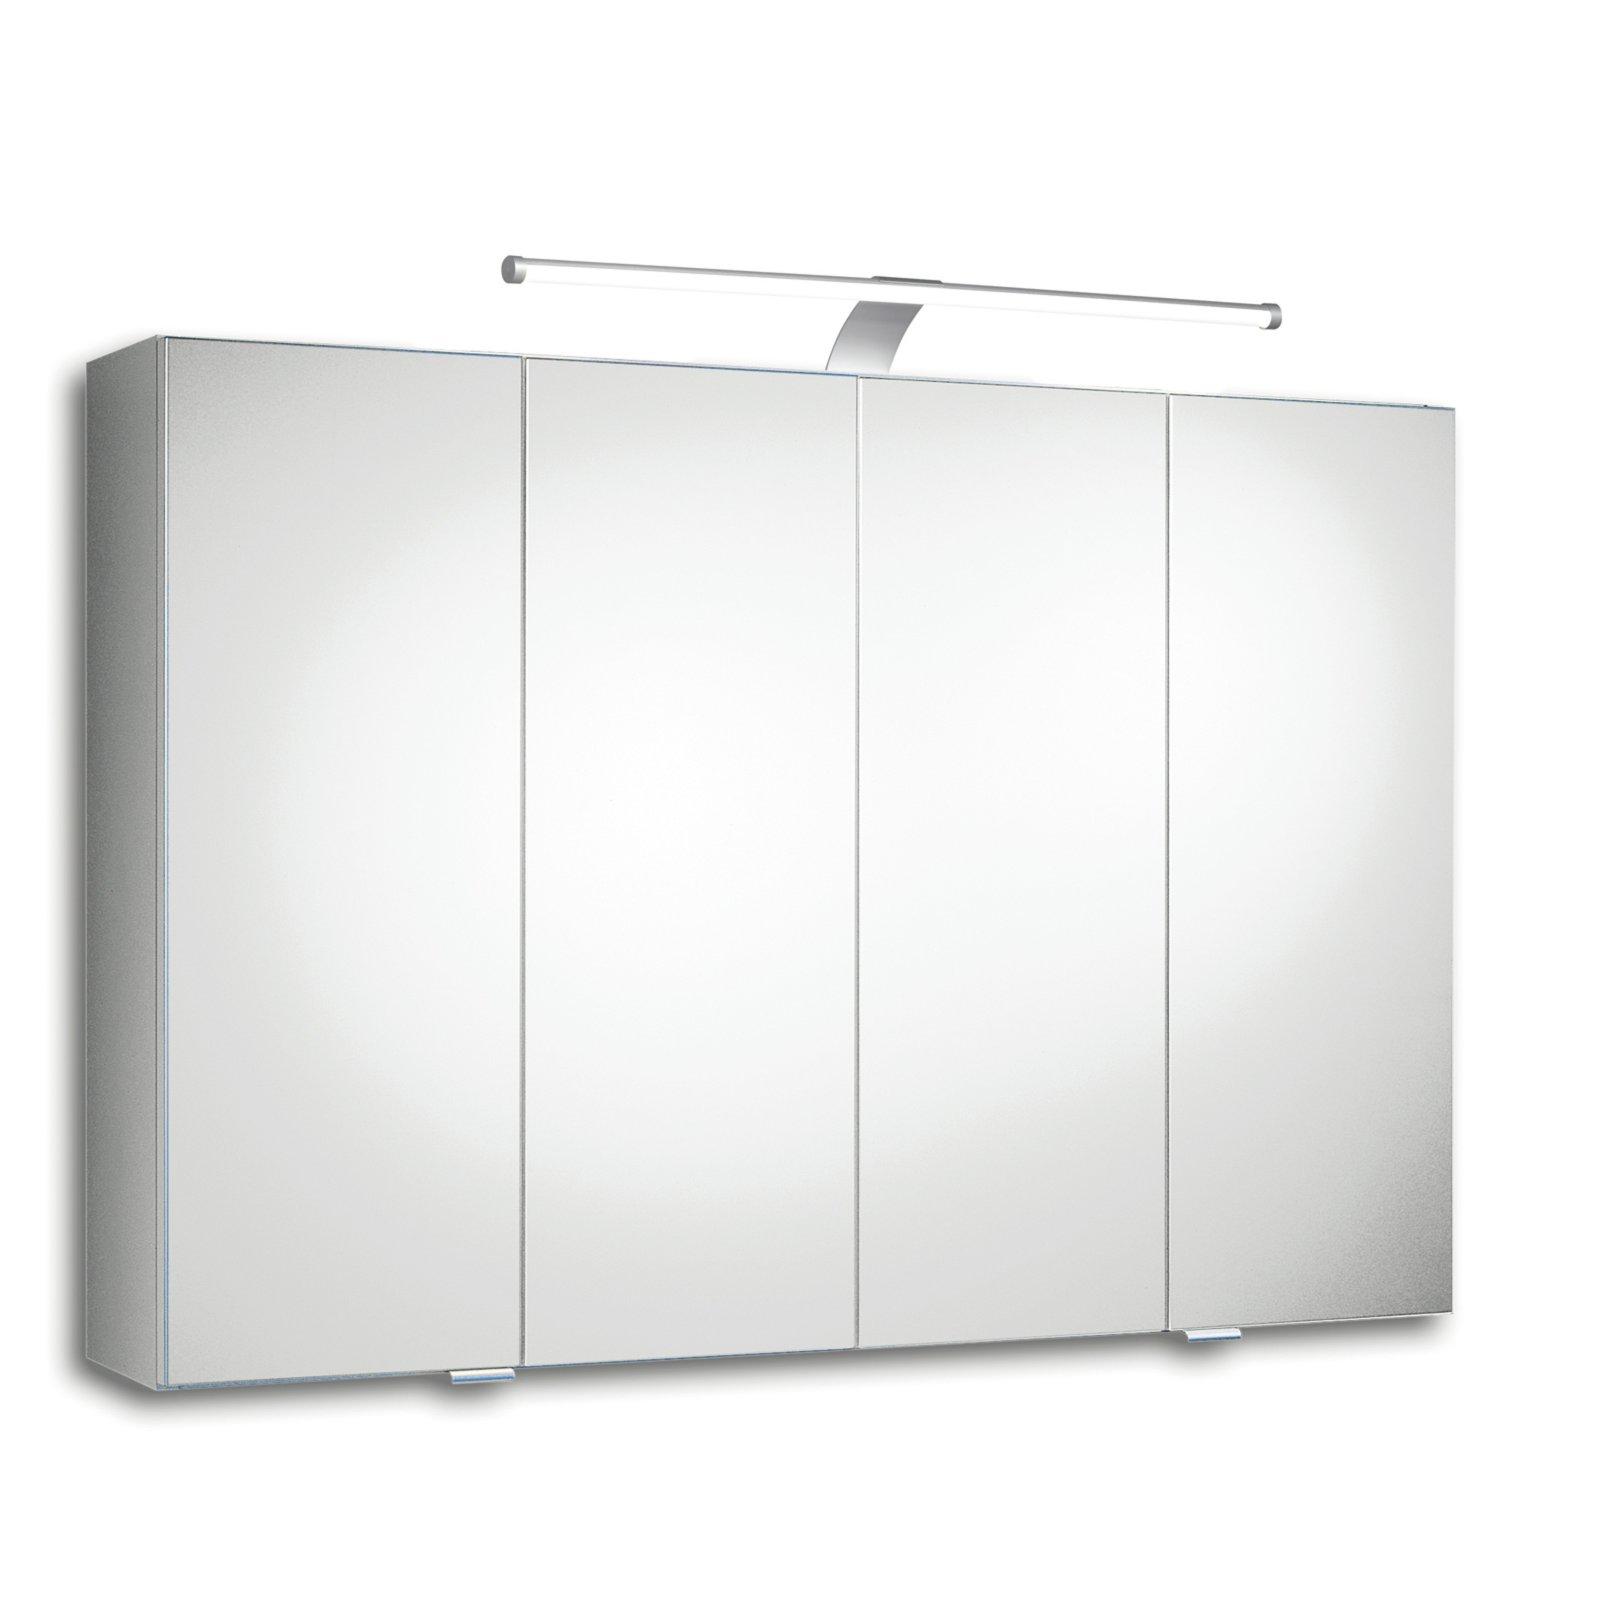 spiegelschrank trento iii wei led spiegelschr nke badschr nke regale m bel. Black Bedroom Furniture Sets. Home Design Ideas